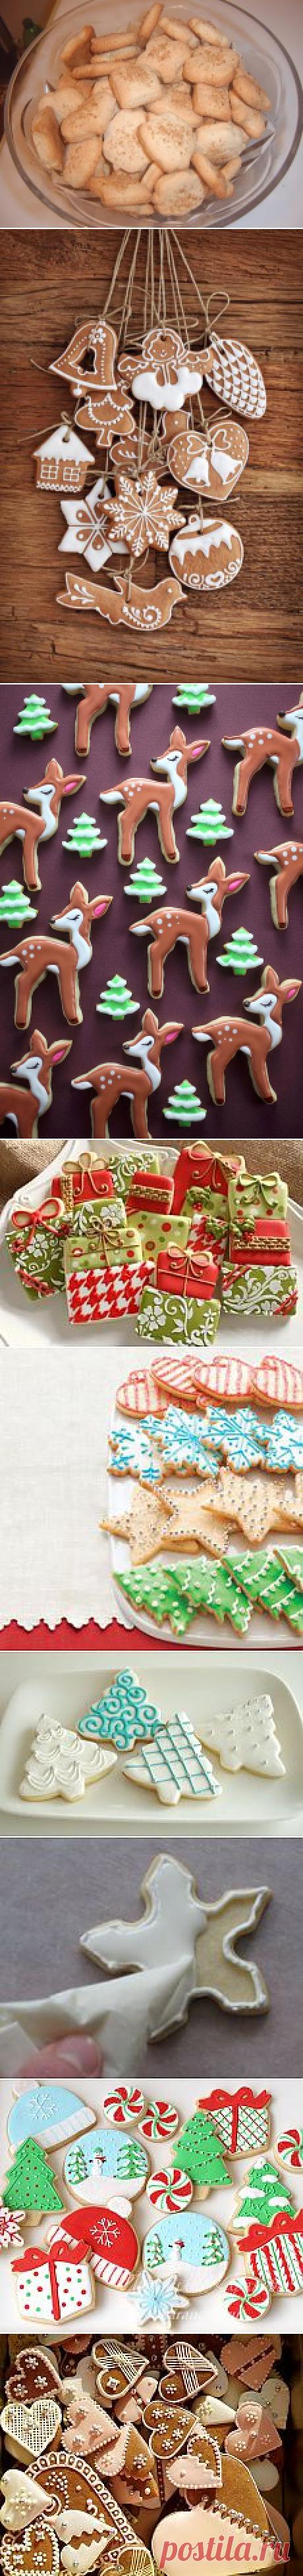 Search on Postila: Christmas cookies